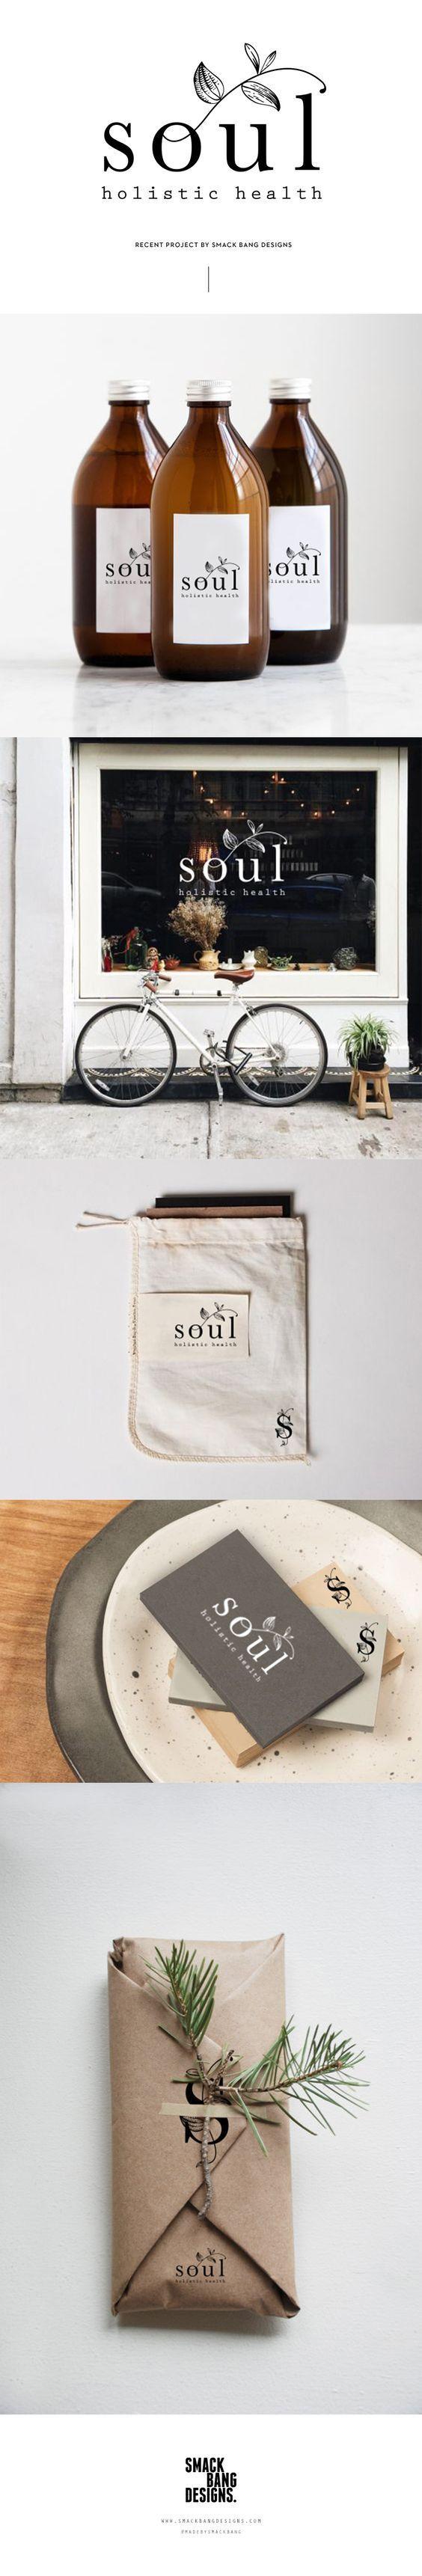 Soul Holistic Health Branding by Smack Bang Designs | Fivestar Branding Agency – Design and Branding Agency & Curated Inspiration Gallery #design #designinspiration #logo #logoinspirations #branding #brand #brandidentity